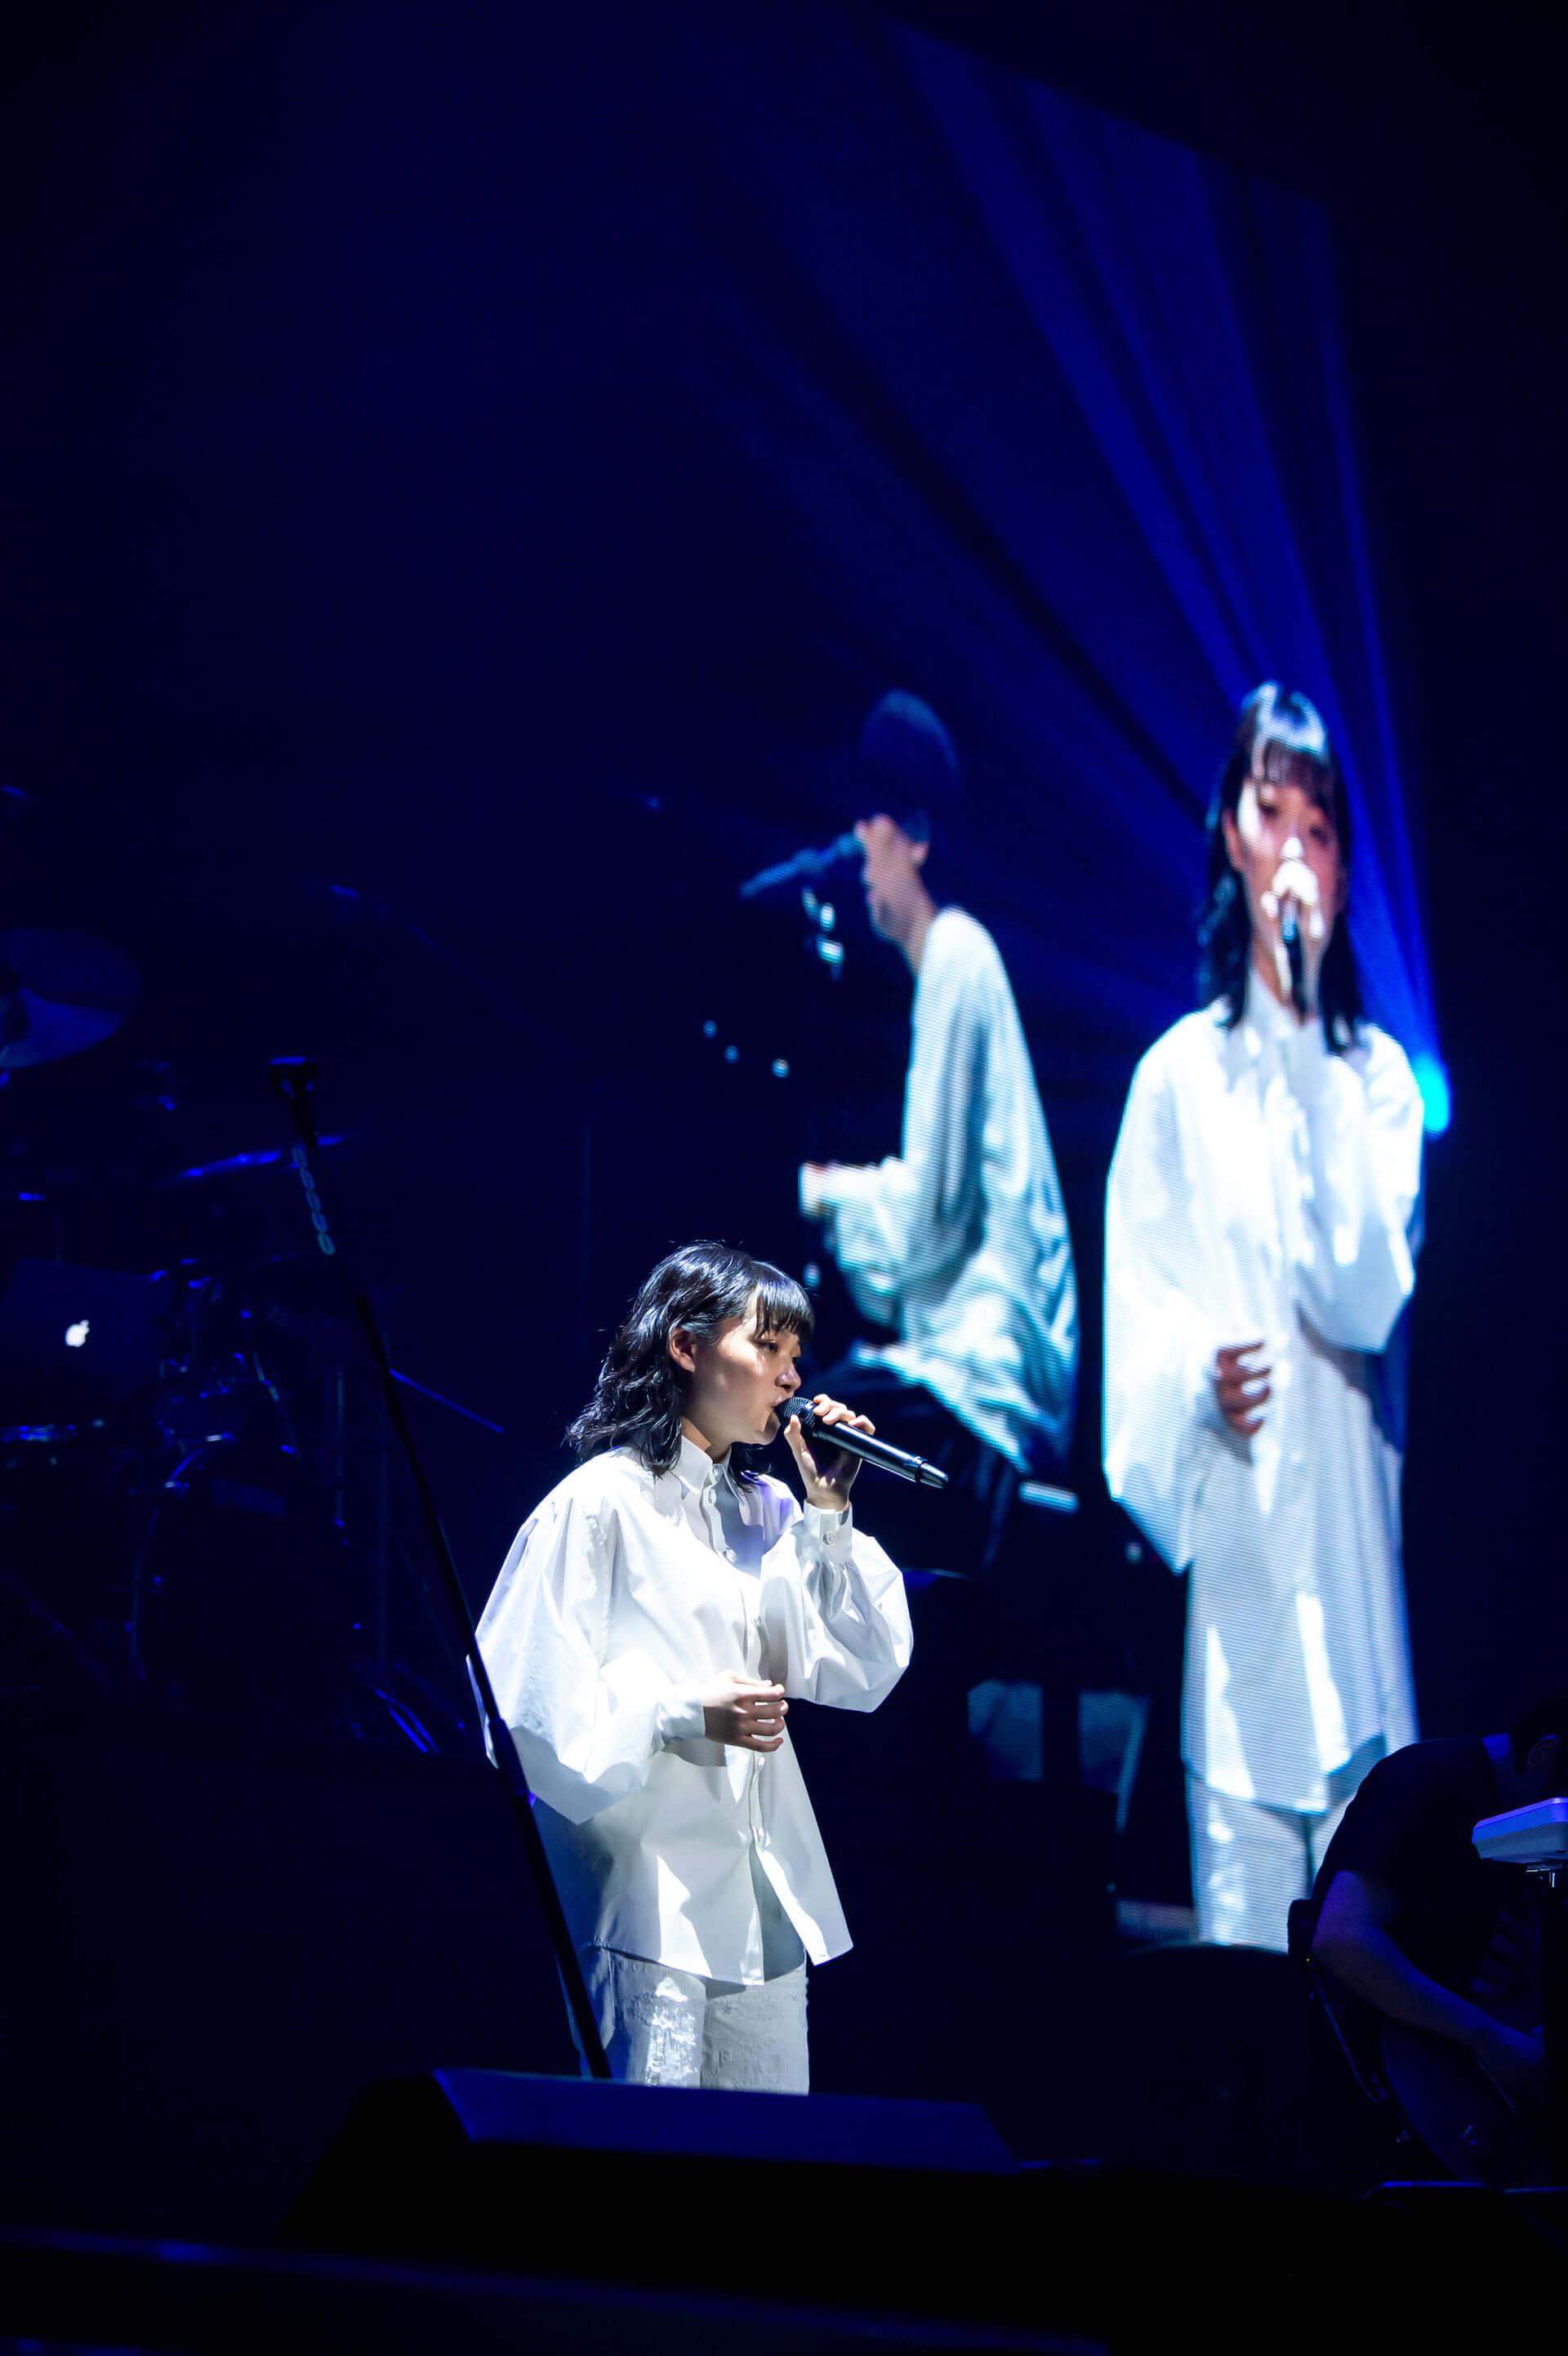 RADWIMPS横浜アリーナ公演のライブ写真が公開!<ANTI ANTI GENERATION TOUR 2019>レポート music190830_radwimps_live_10-1920x2885